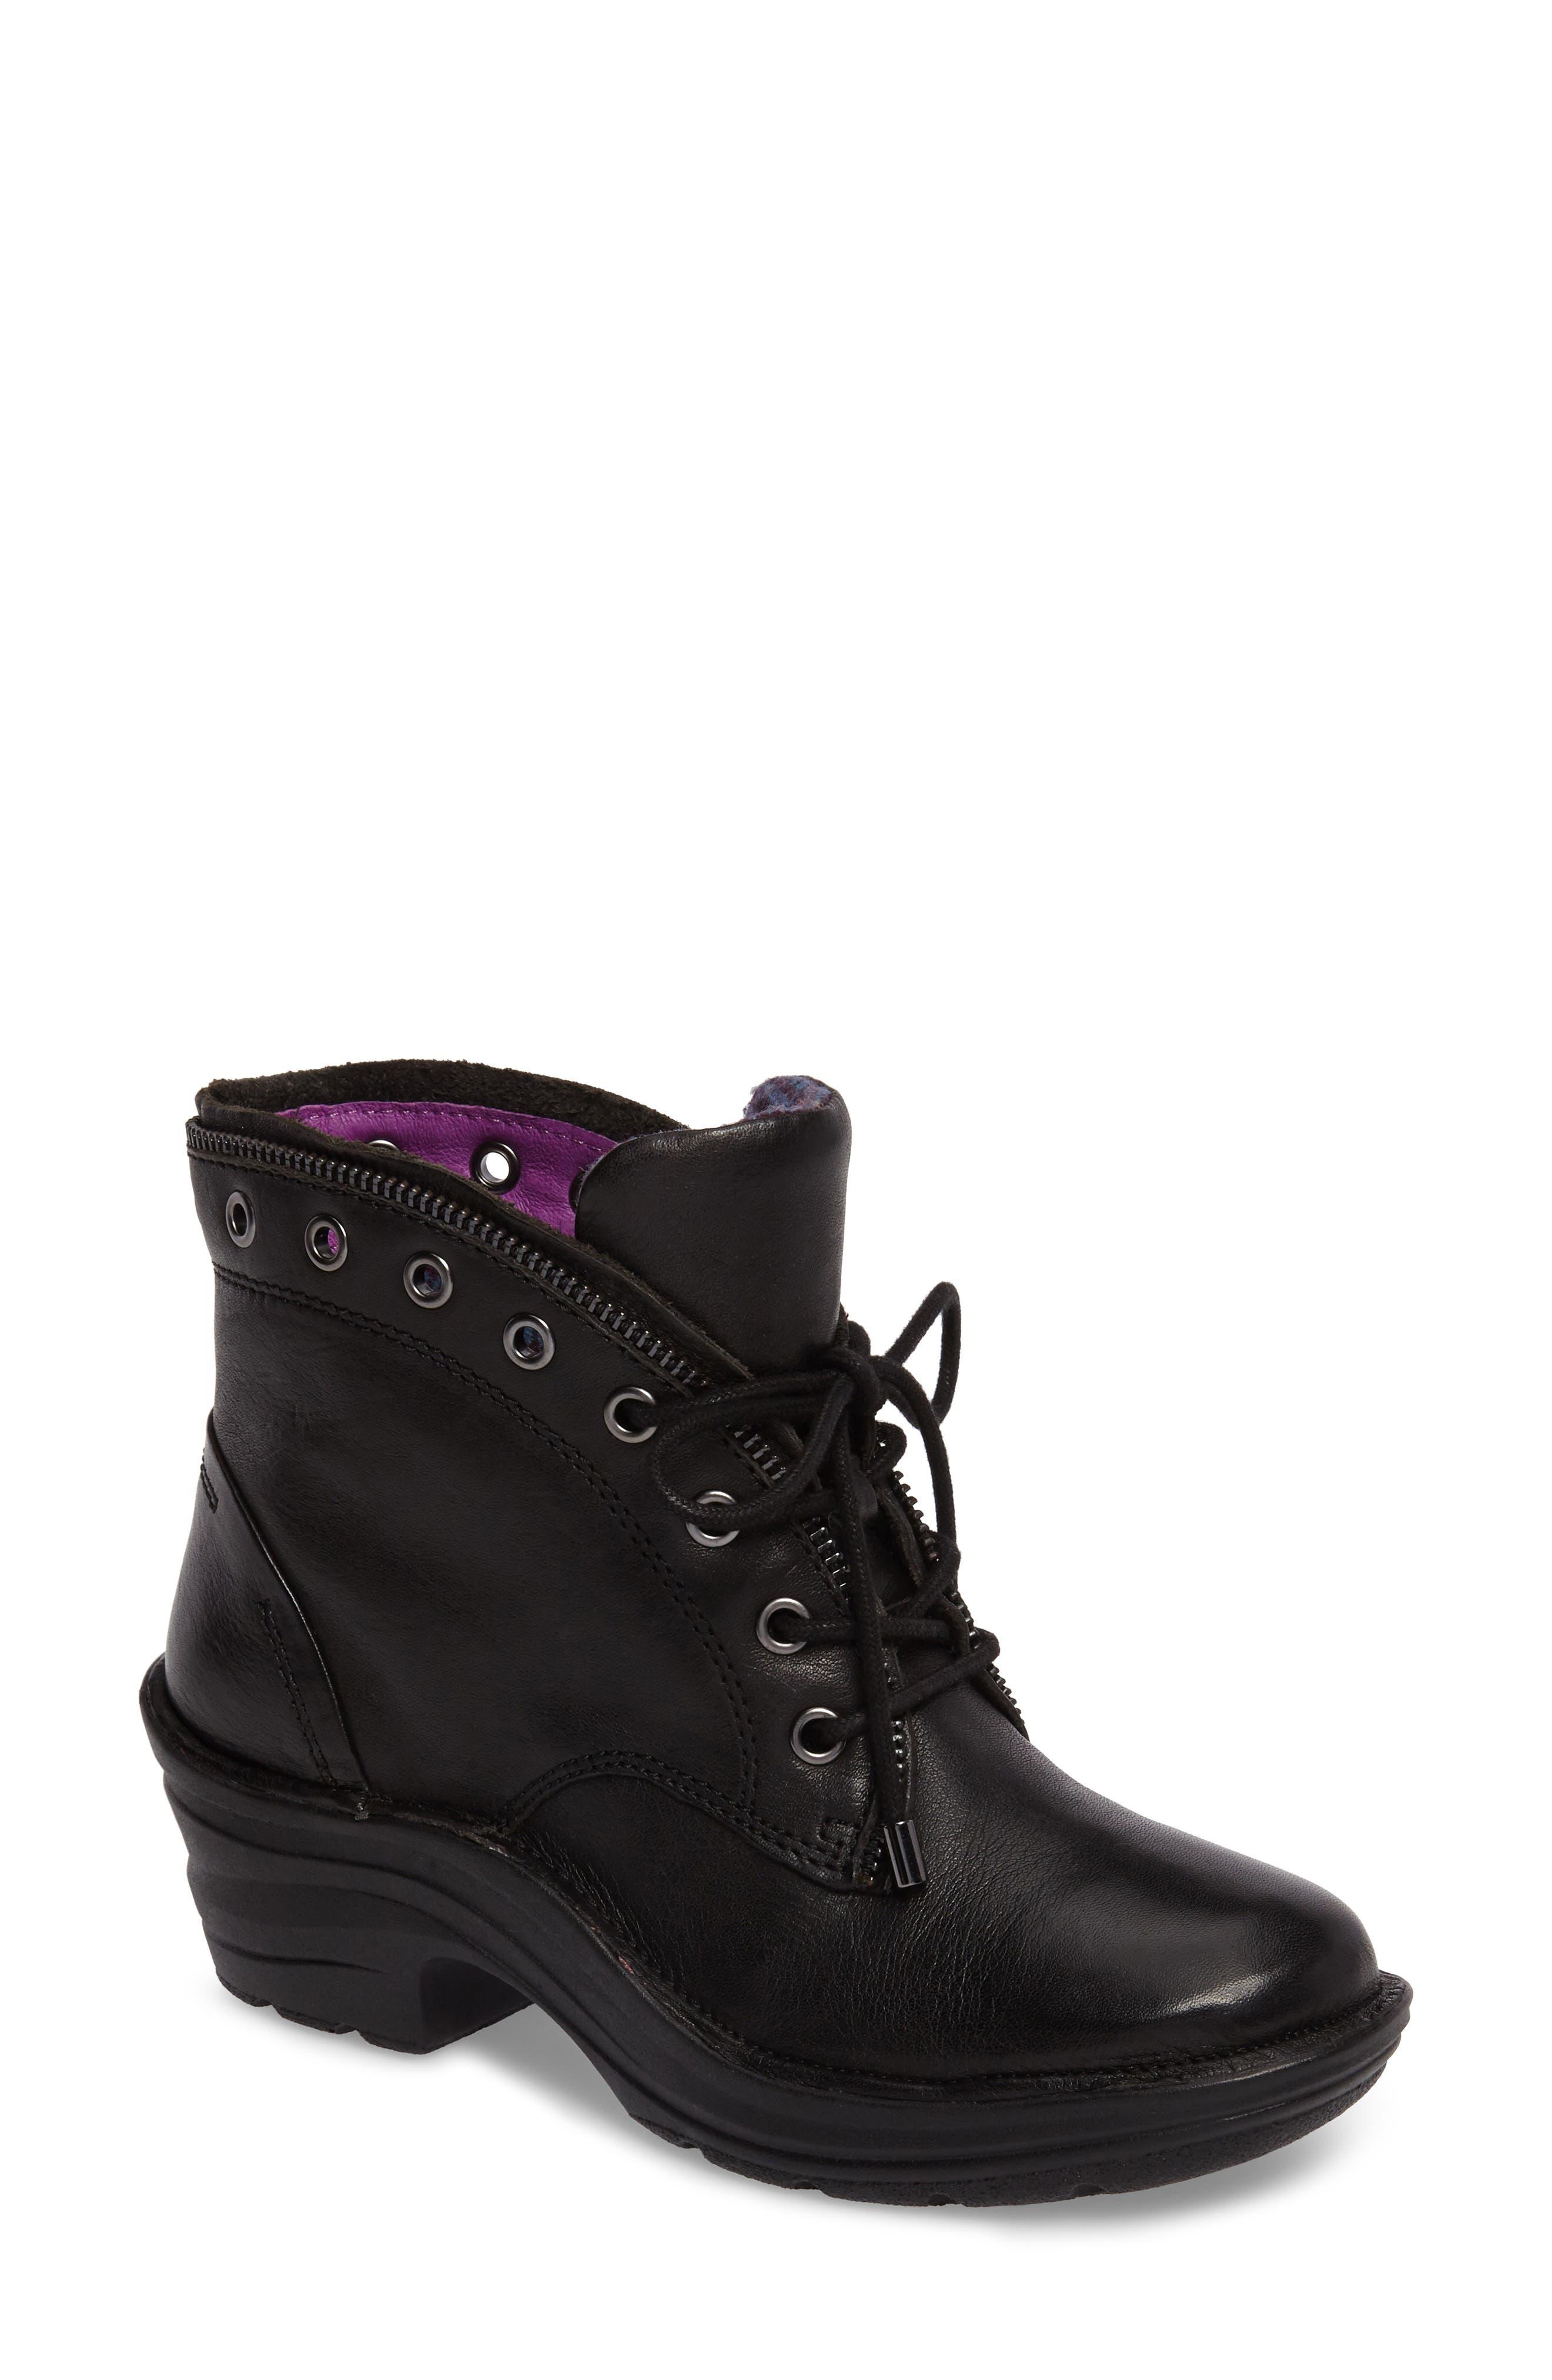 Rangely Boot,                             Main thumbnail 1, color,                             001